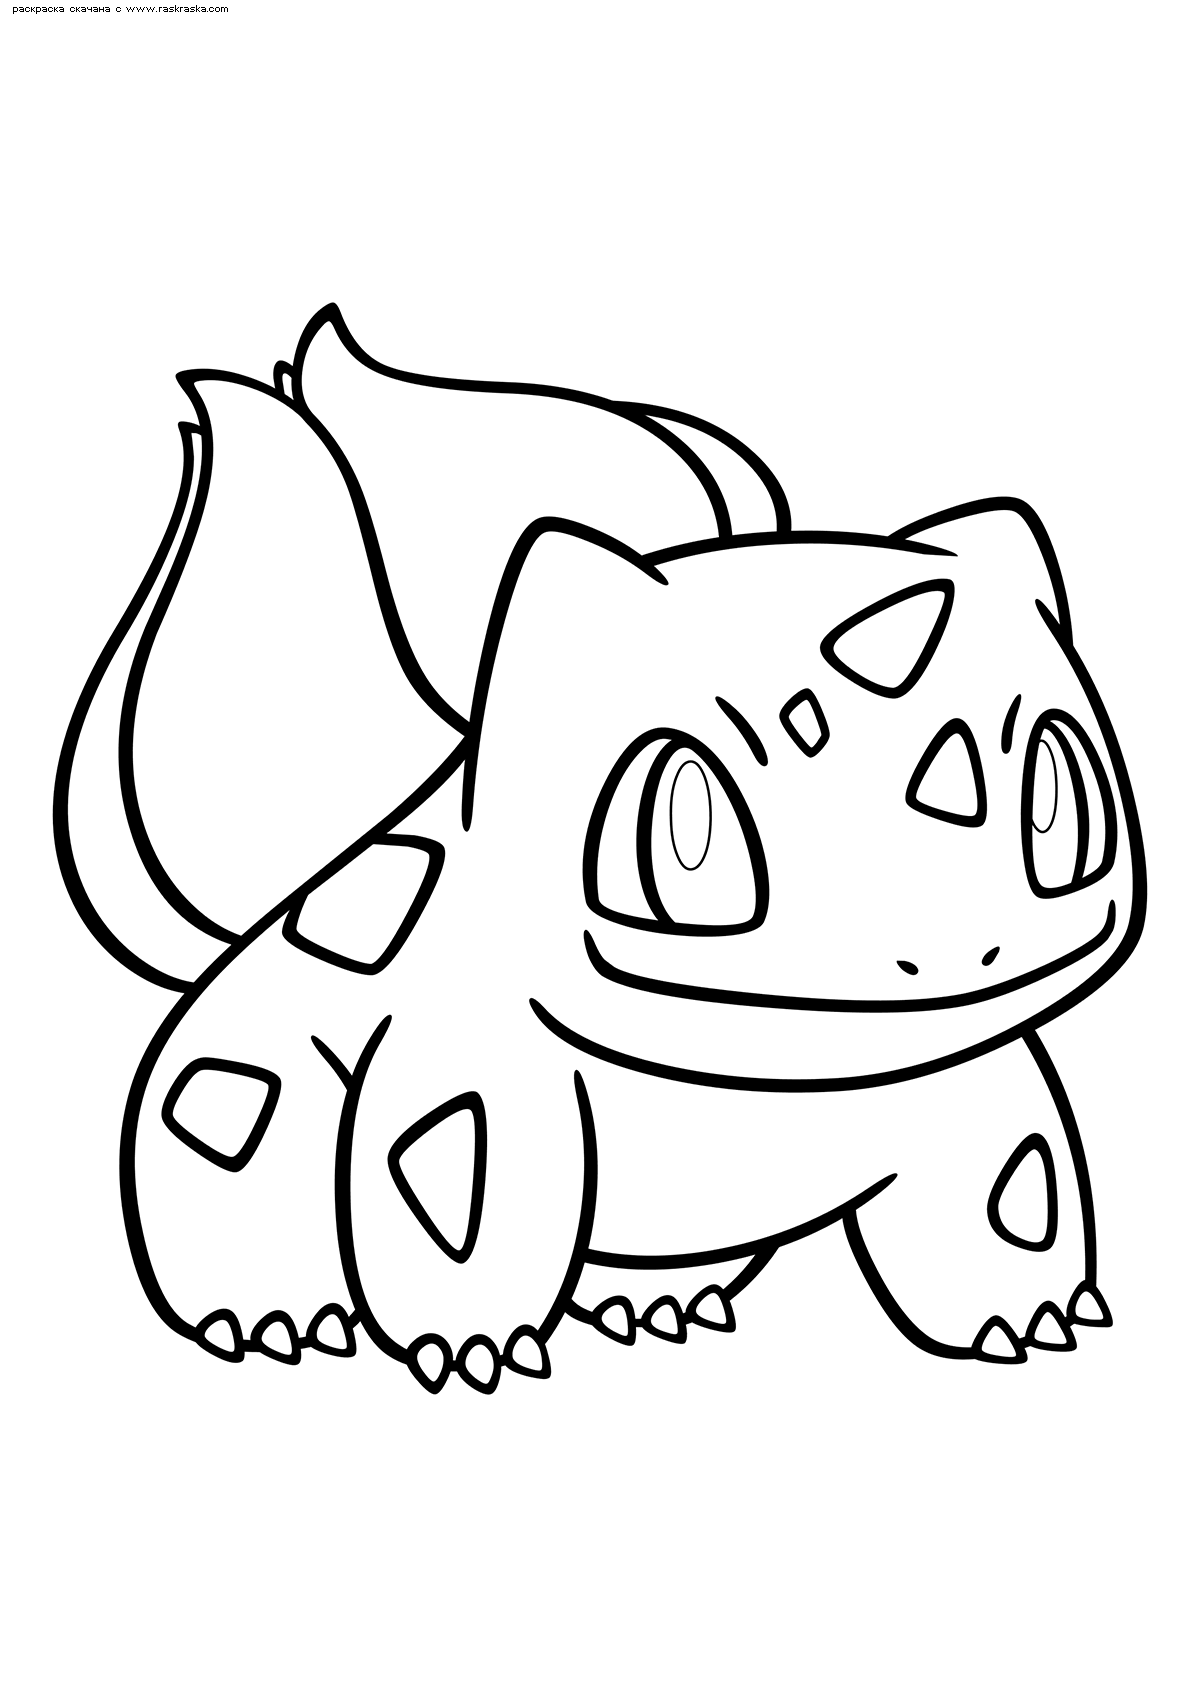 Раскраска Покемон Бульбазавр (Bulbasaur) | Раскраски ...